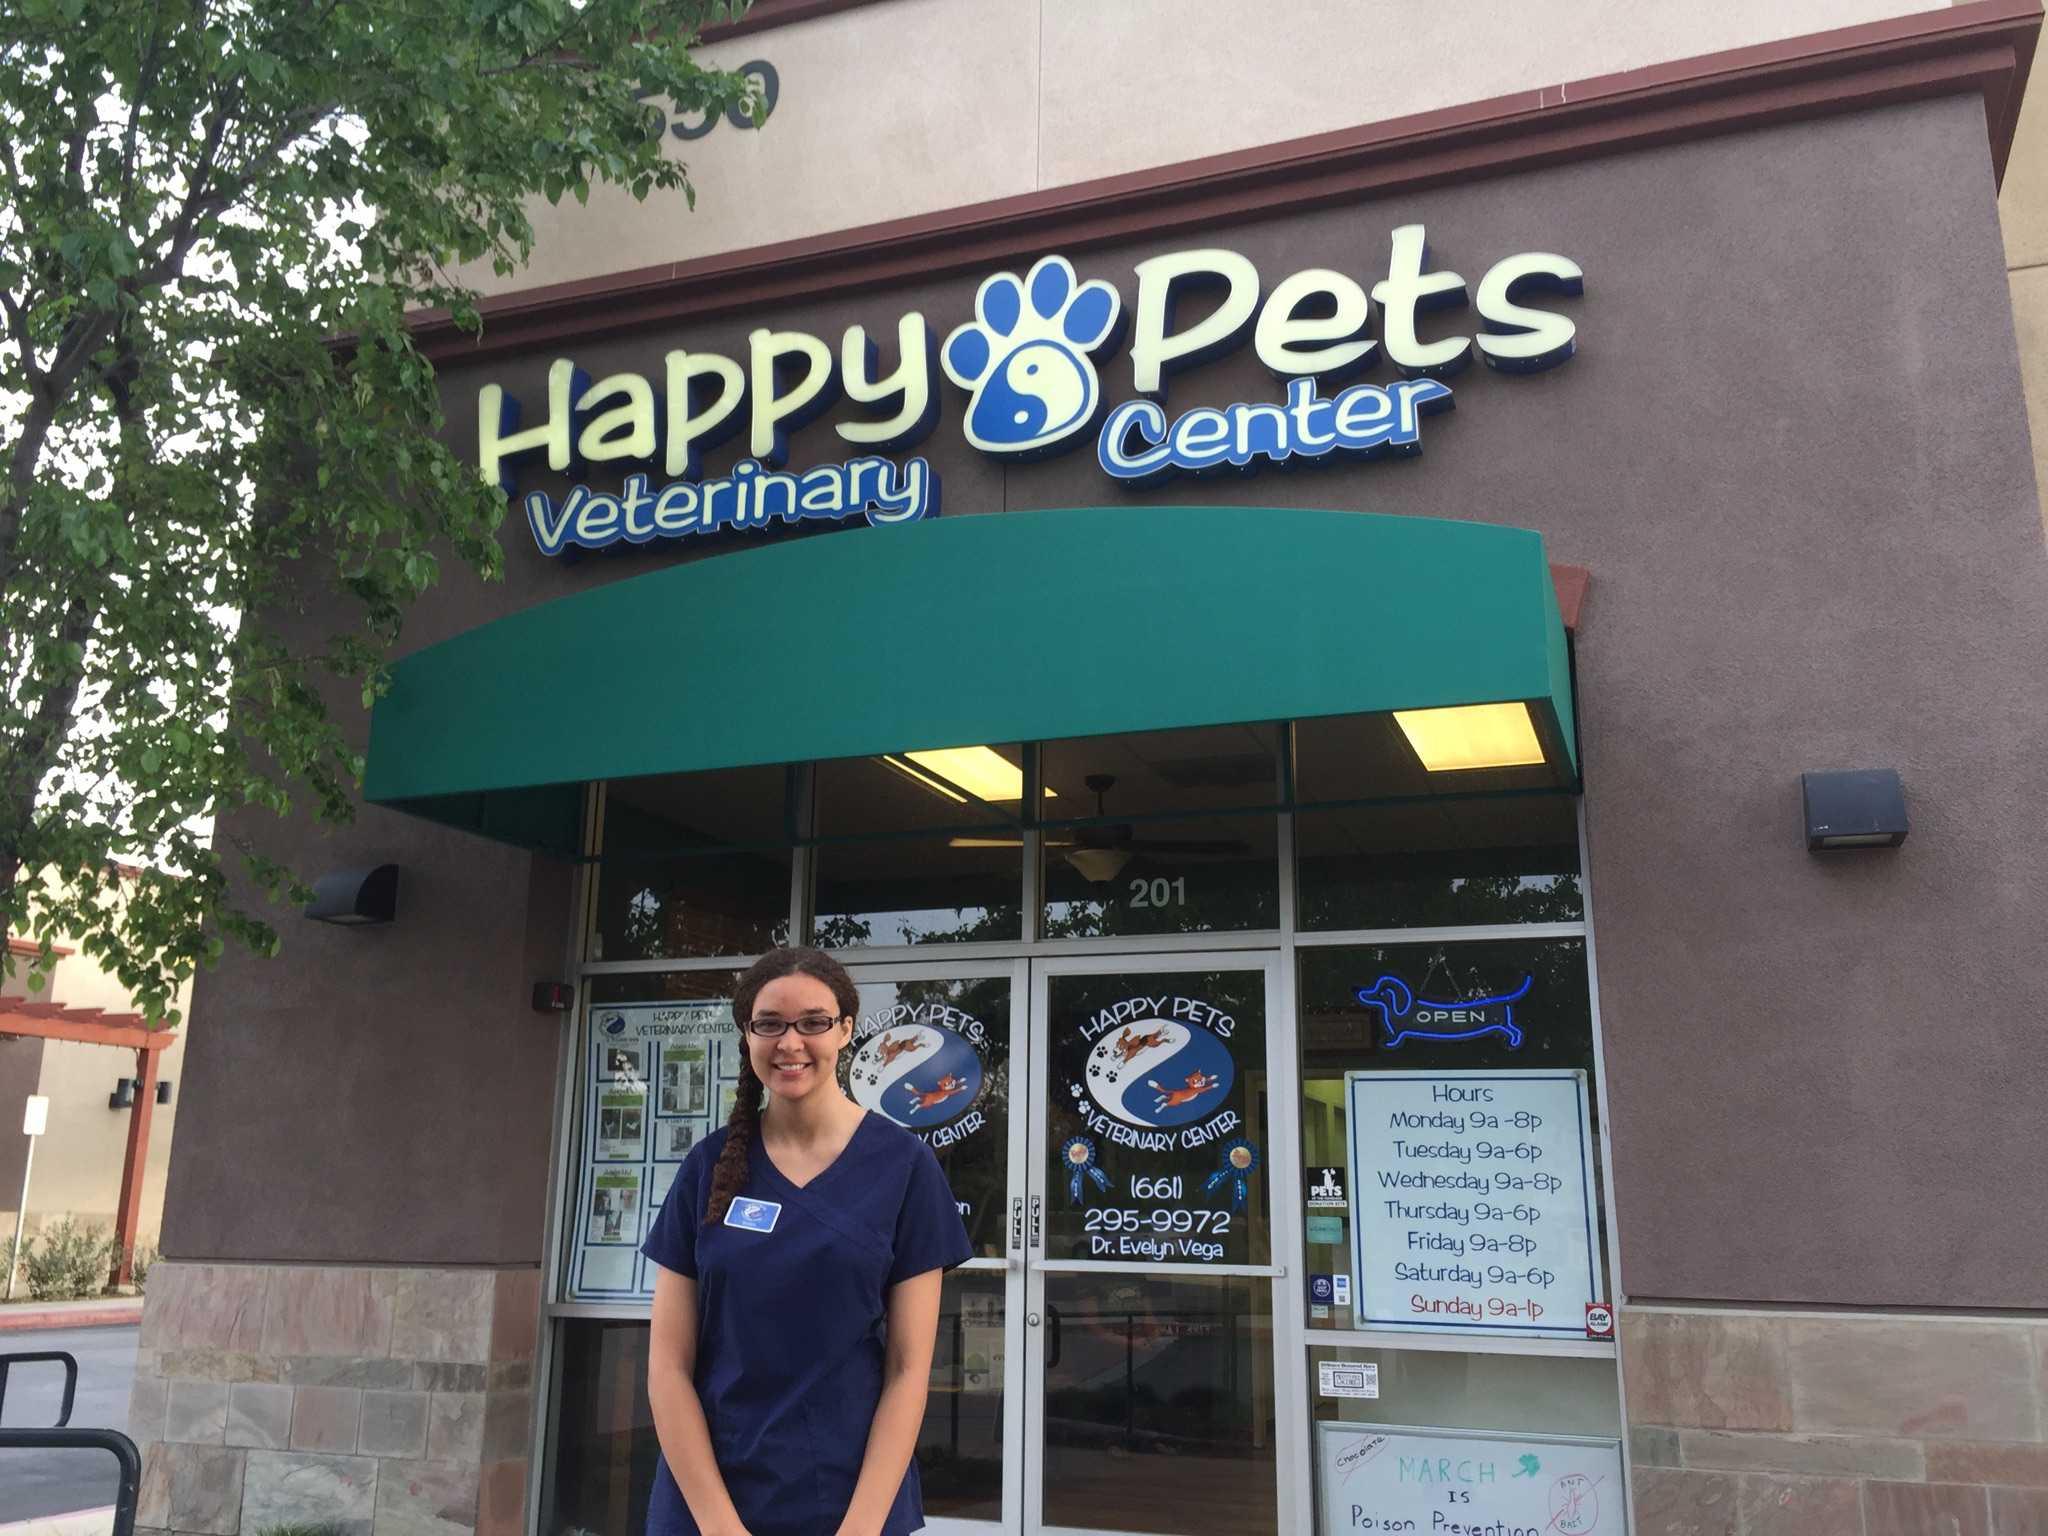 Amaya Watters interns at Happy Pets Veterinary Center in Valencia.